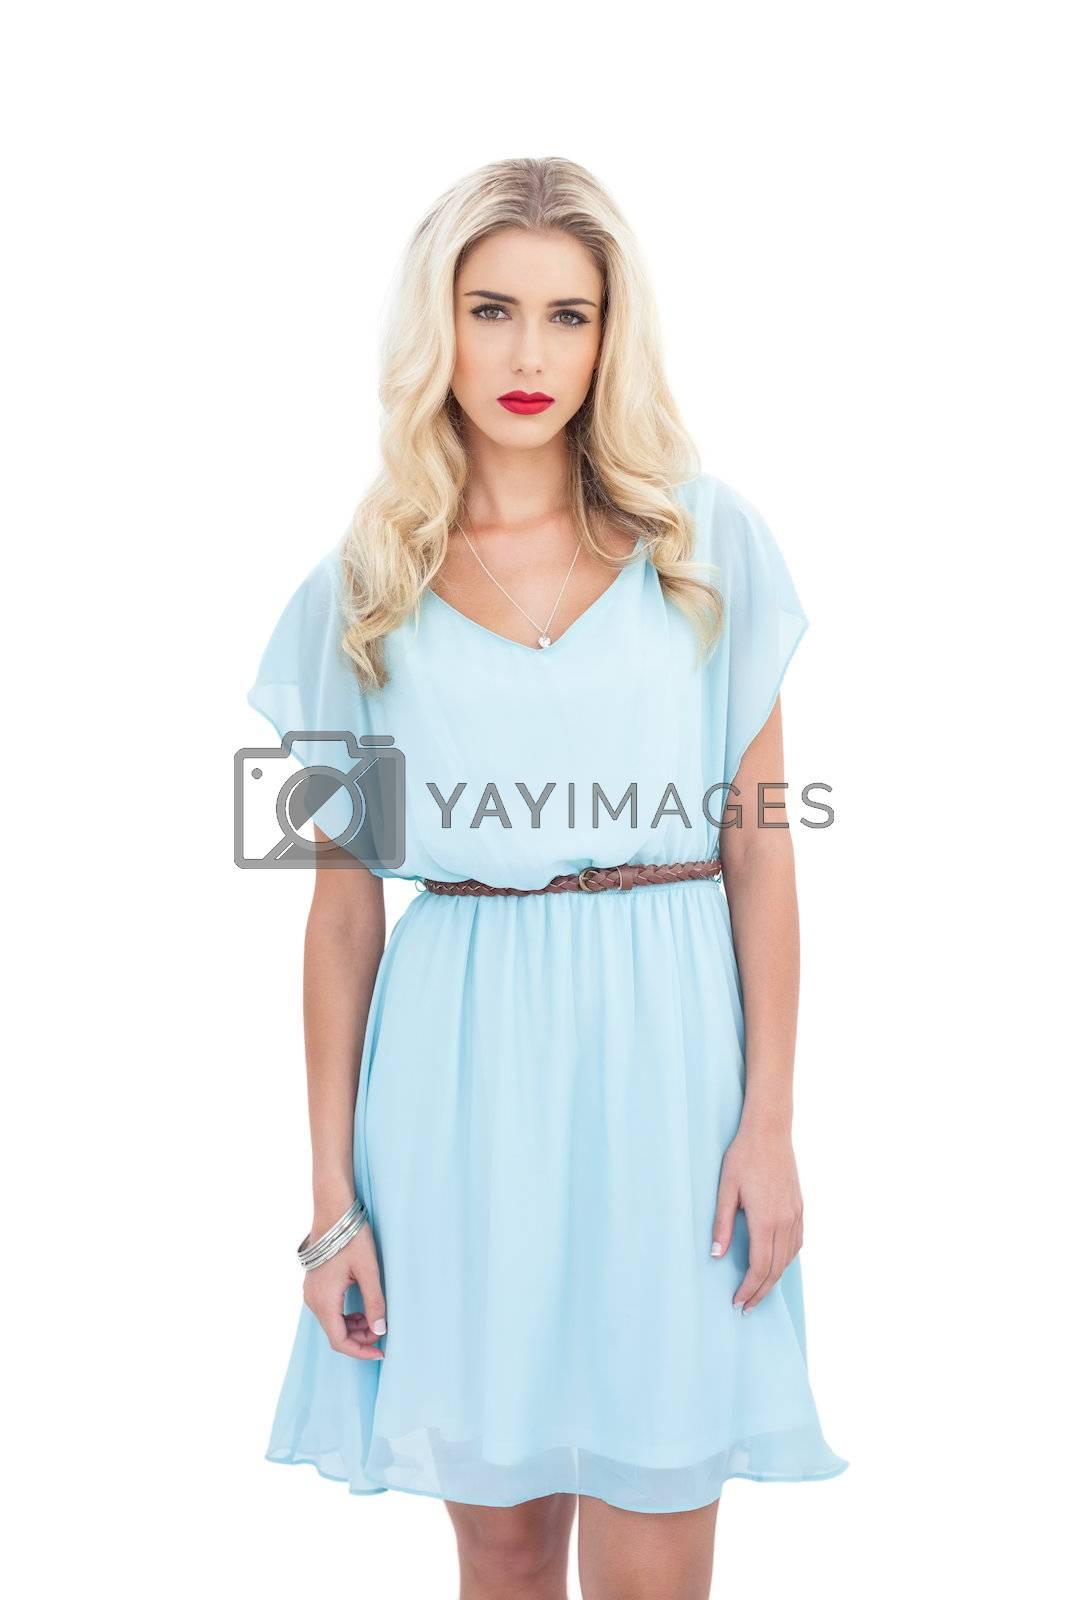 Charming blonde model in blue dress looking at camera by Wavebreakmedia